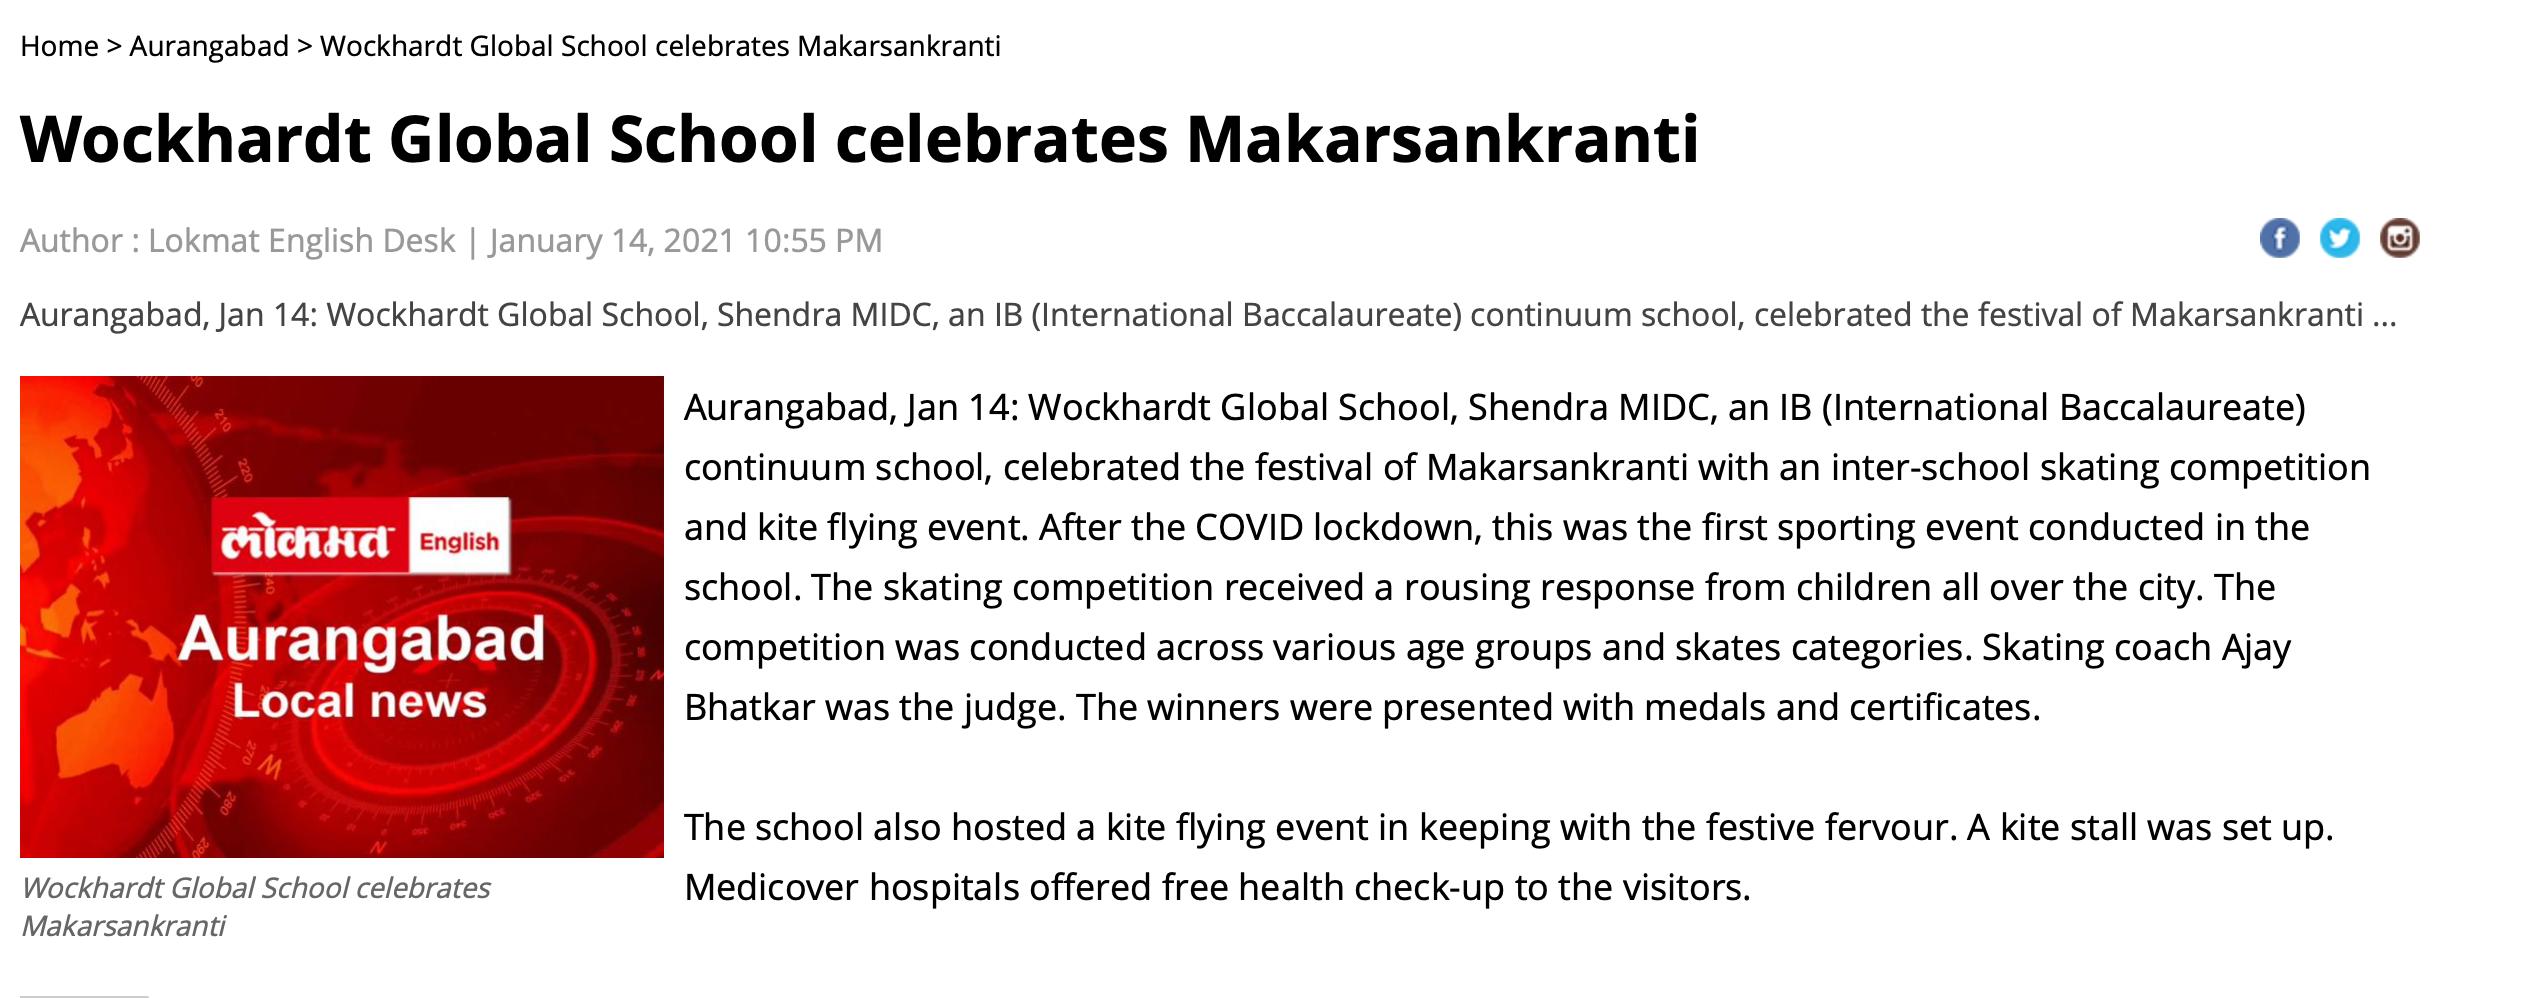 https://english.lokmat.com/aurangabad/wockhardt-global-school-celebrates-makarsankranti/